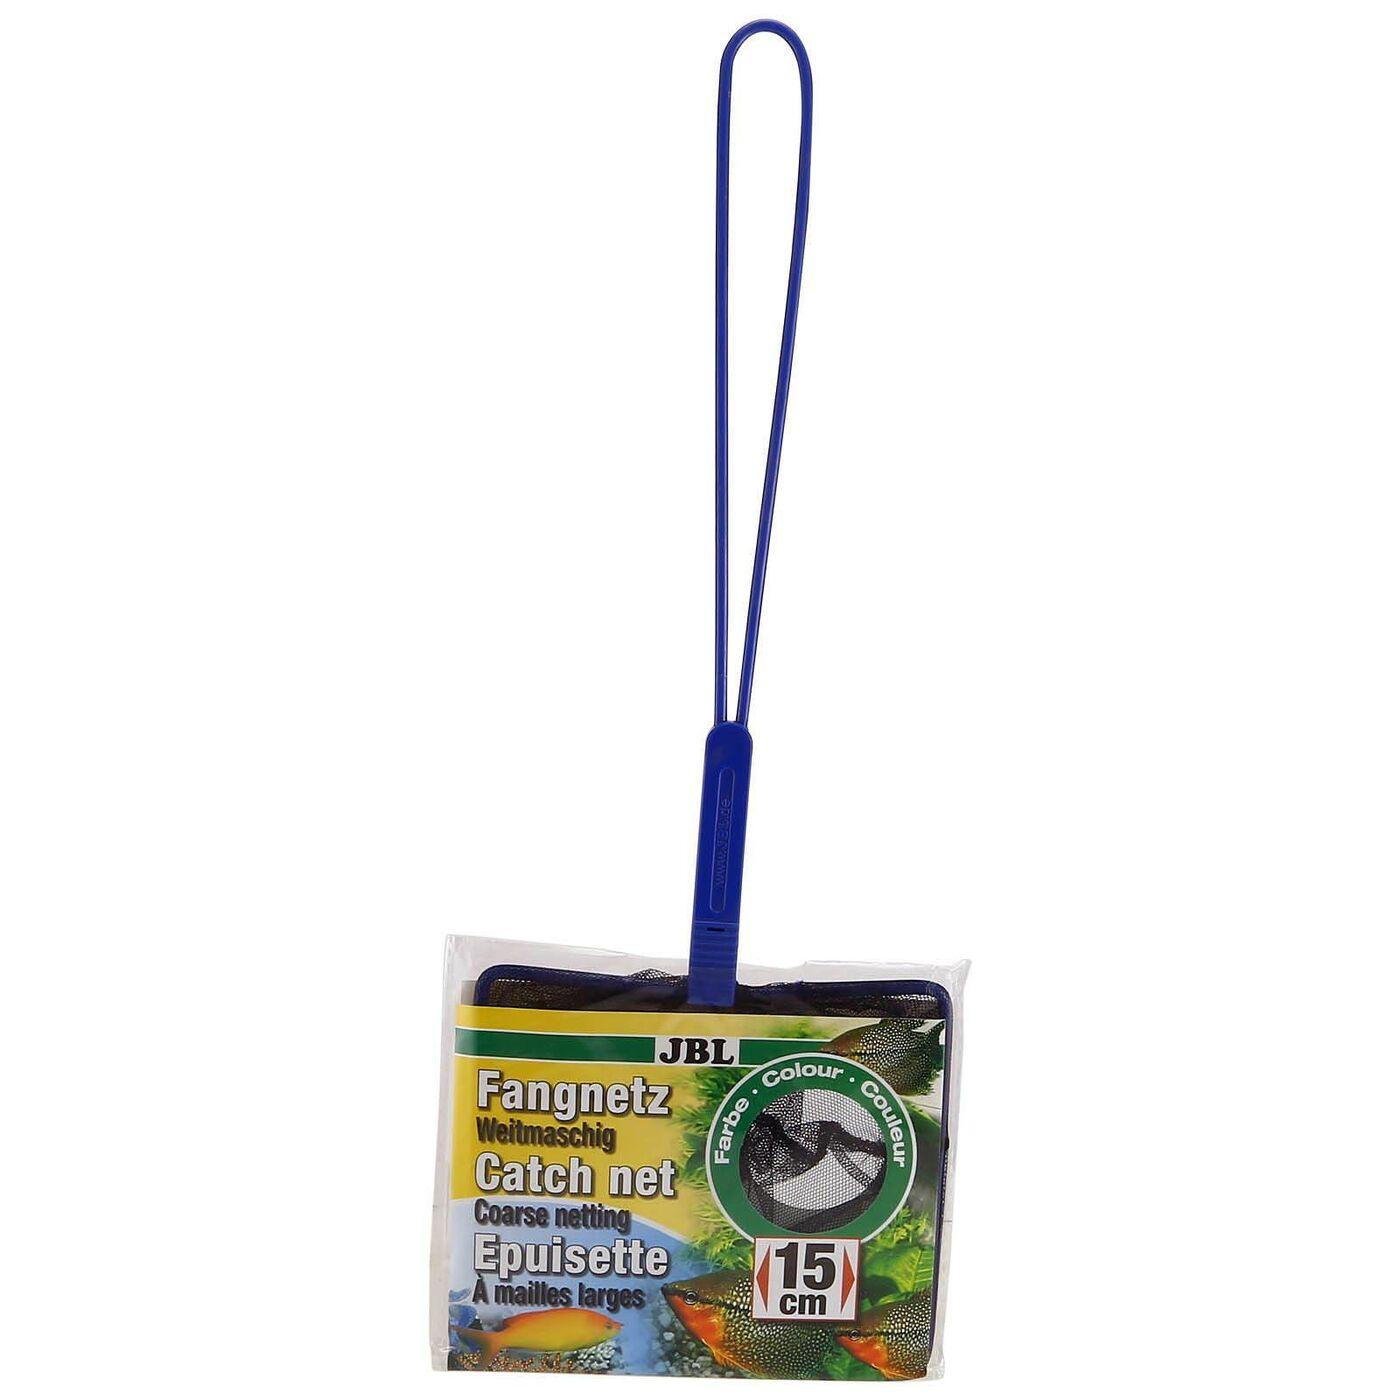 JBL Fish Net PREMIUM fine - Сачок премиум с мелкой сеткой черного цвета, 31х5,5 см